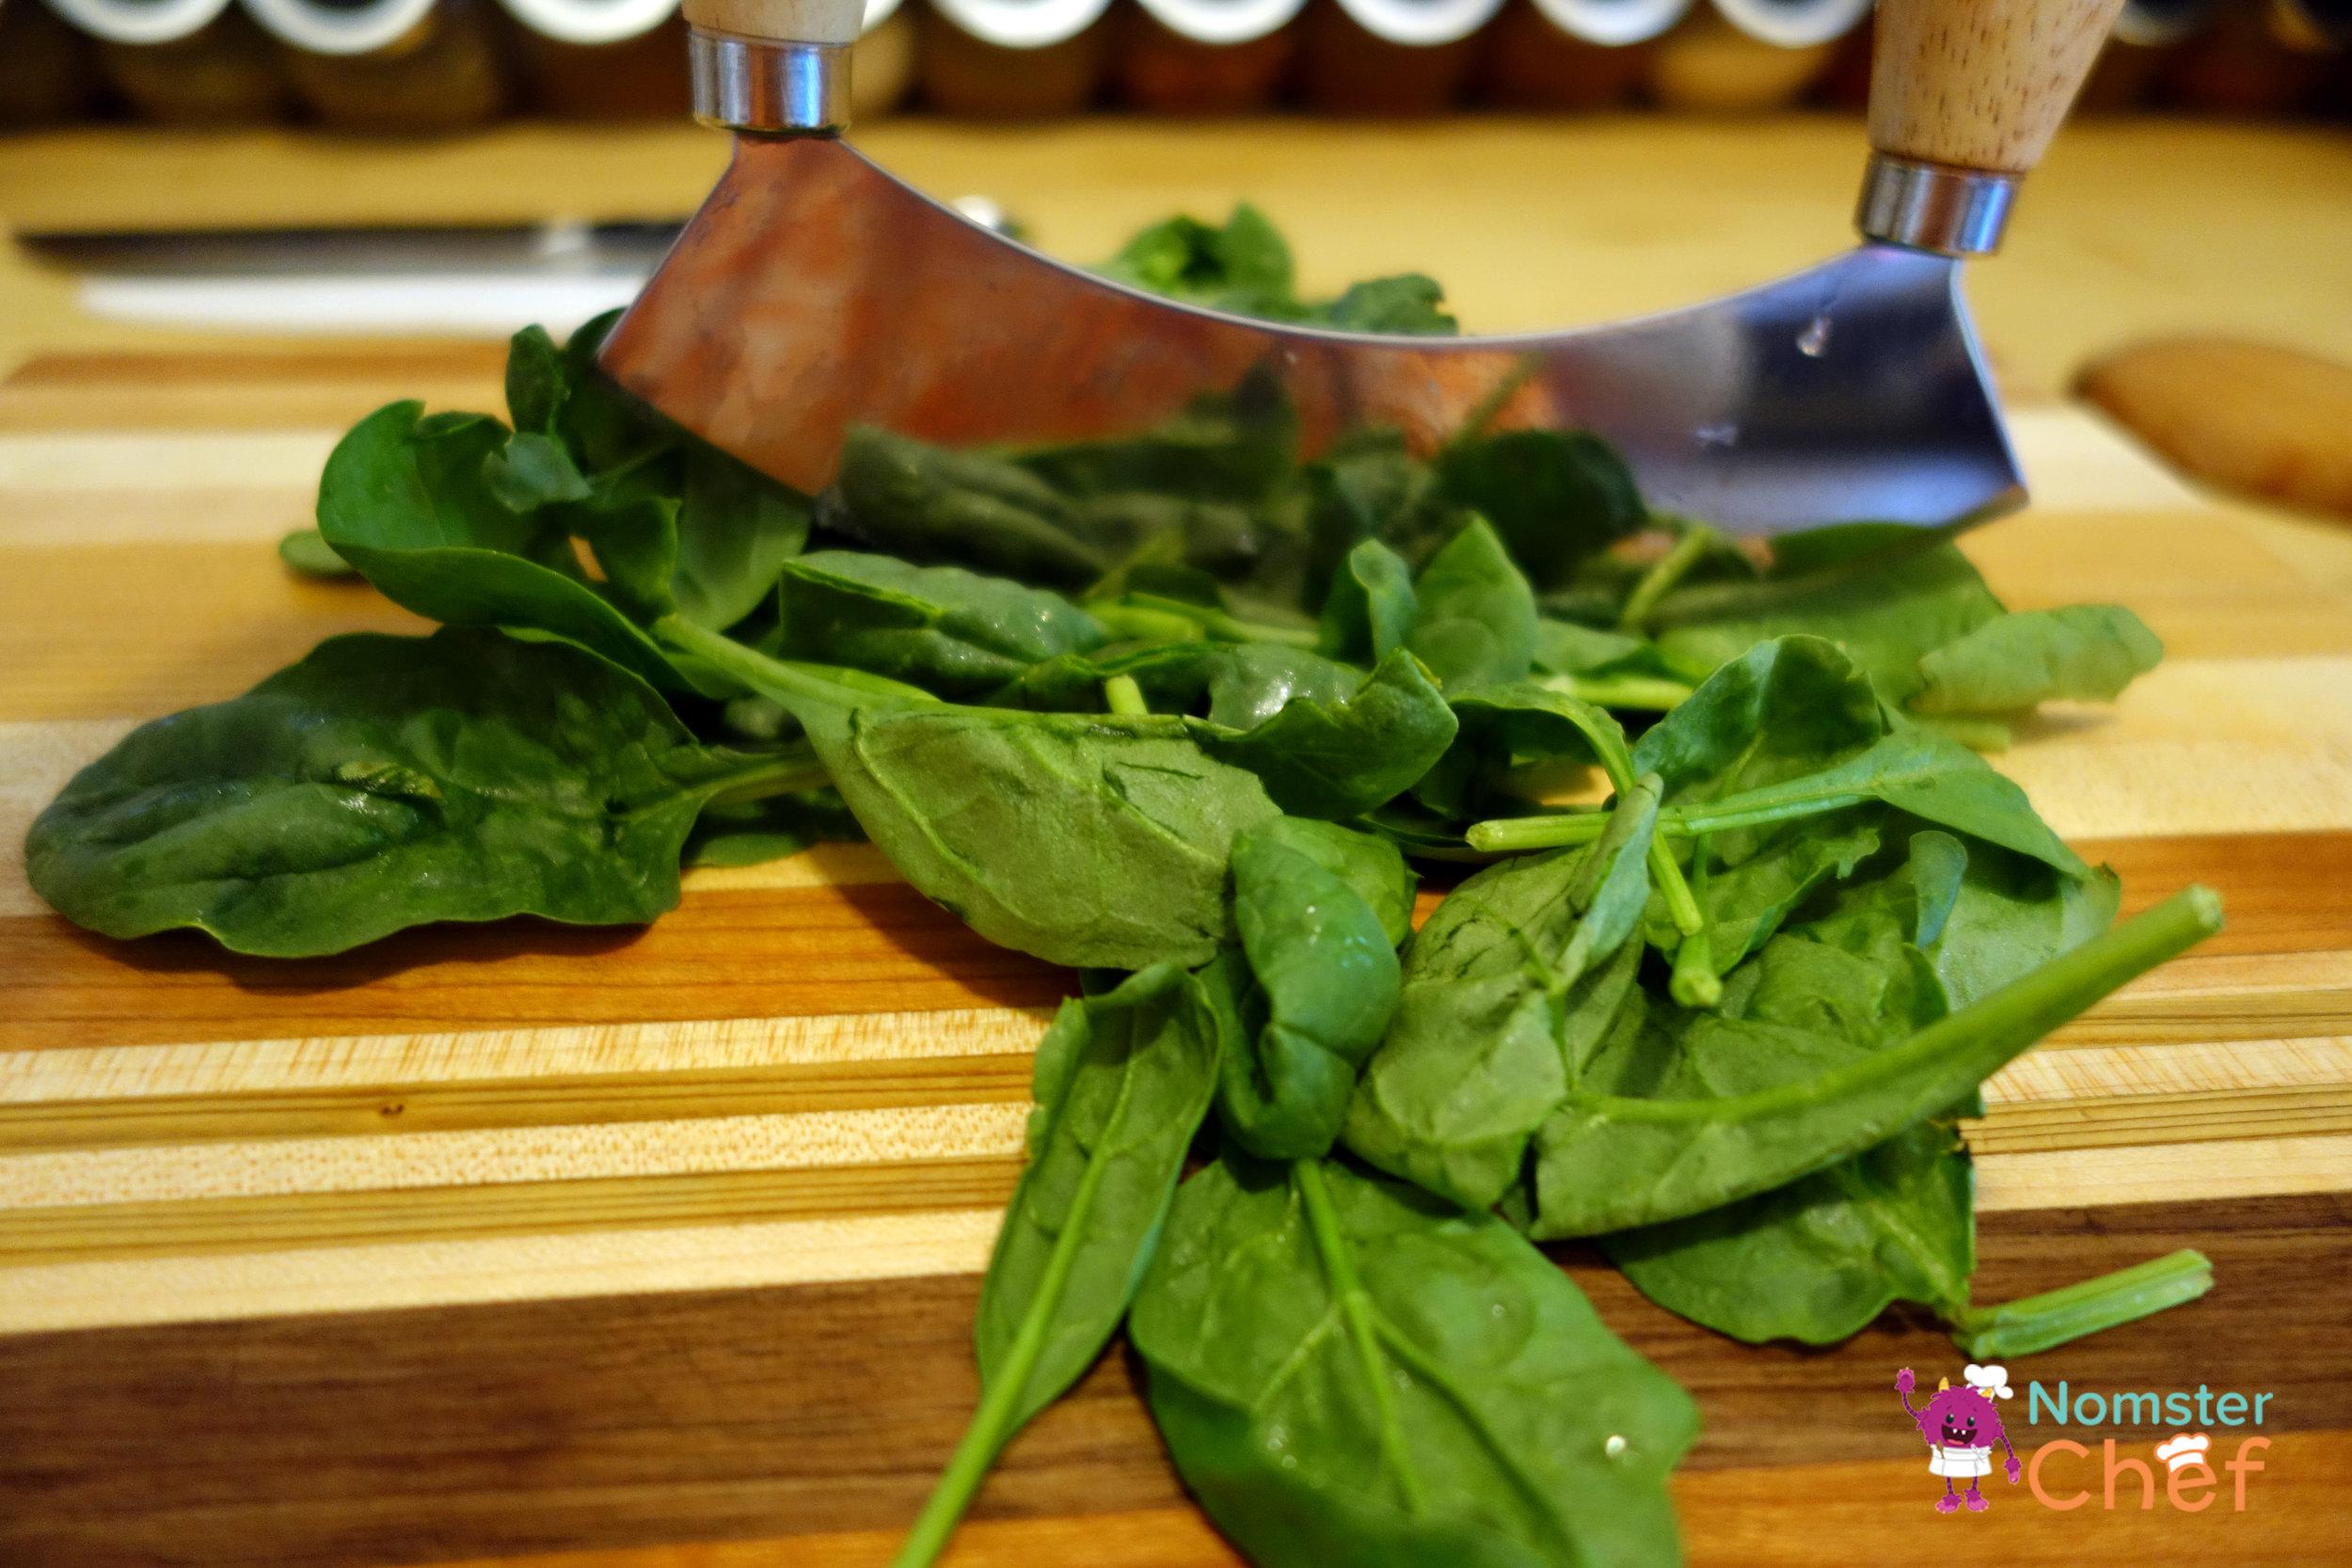 spinach chop-quinoa snack bites-Nomster Chef